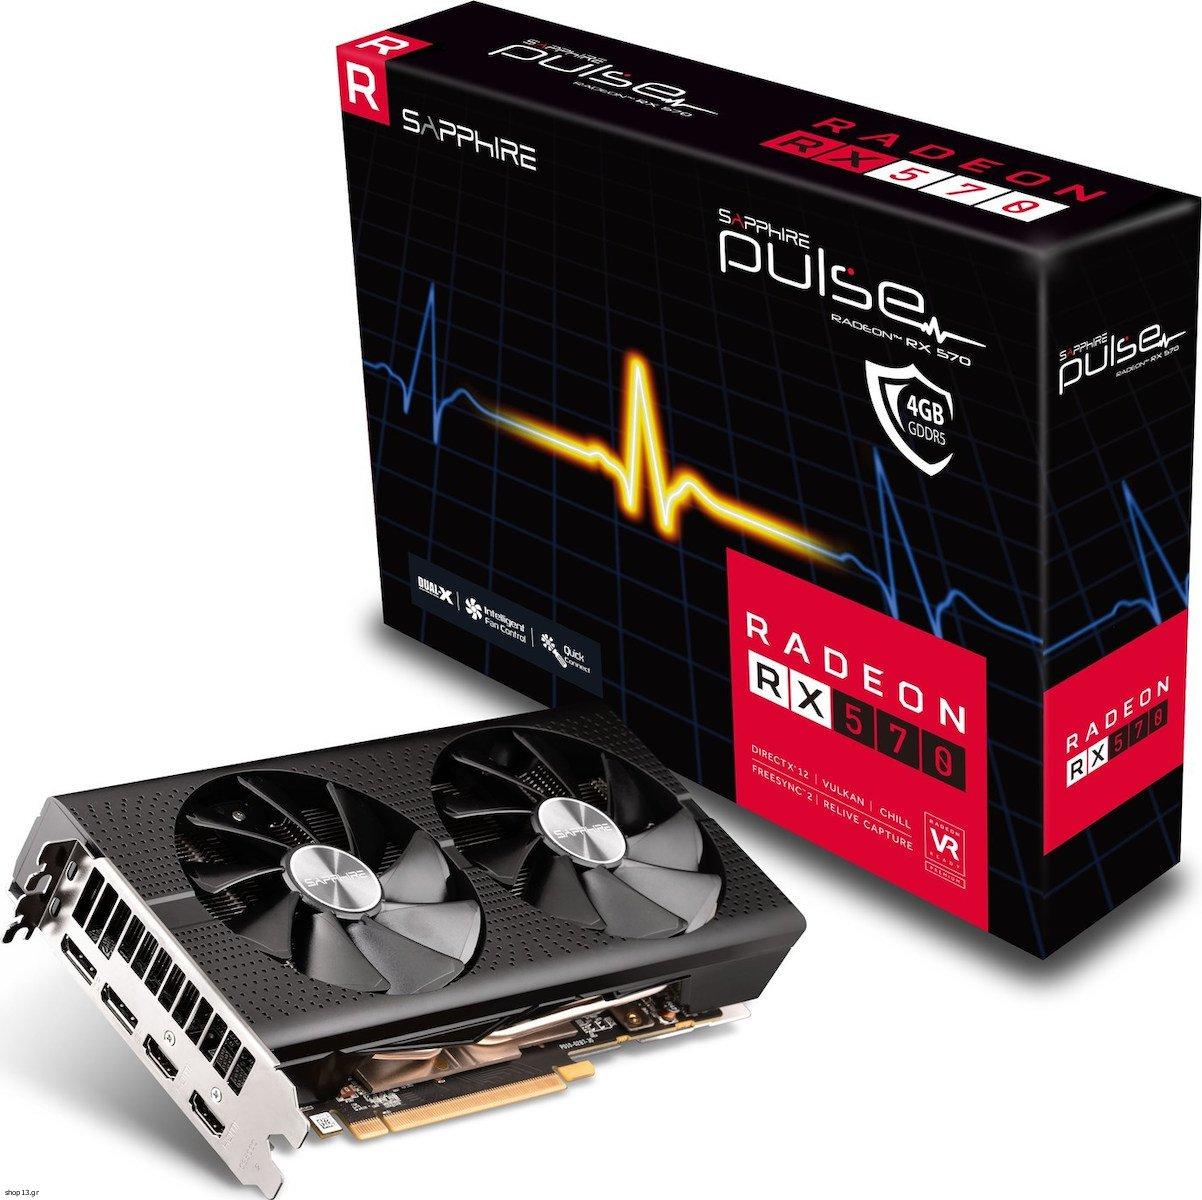 SAPPHIRE RADEON PULSE RX 570 OC 4GB - (11266-67-20G ...